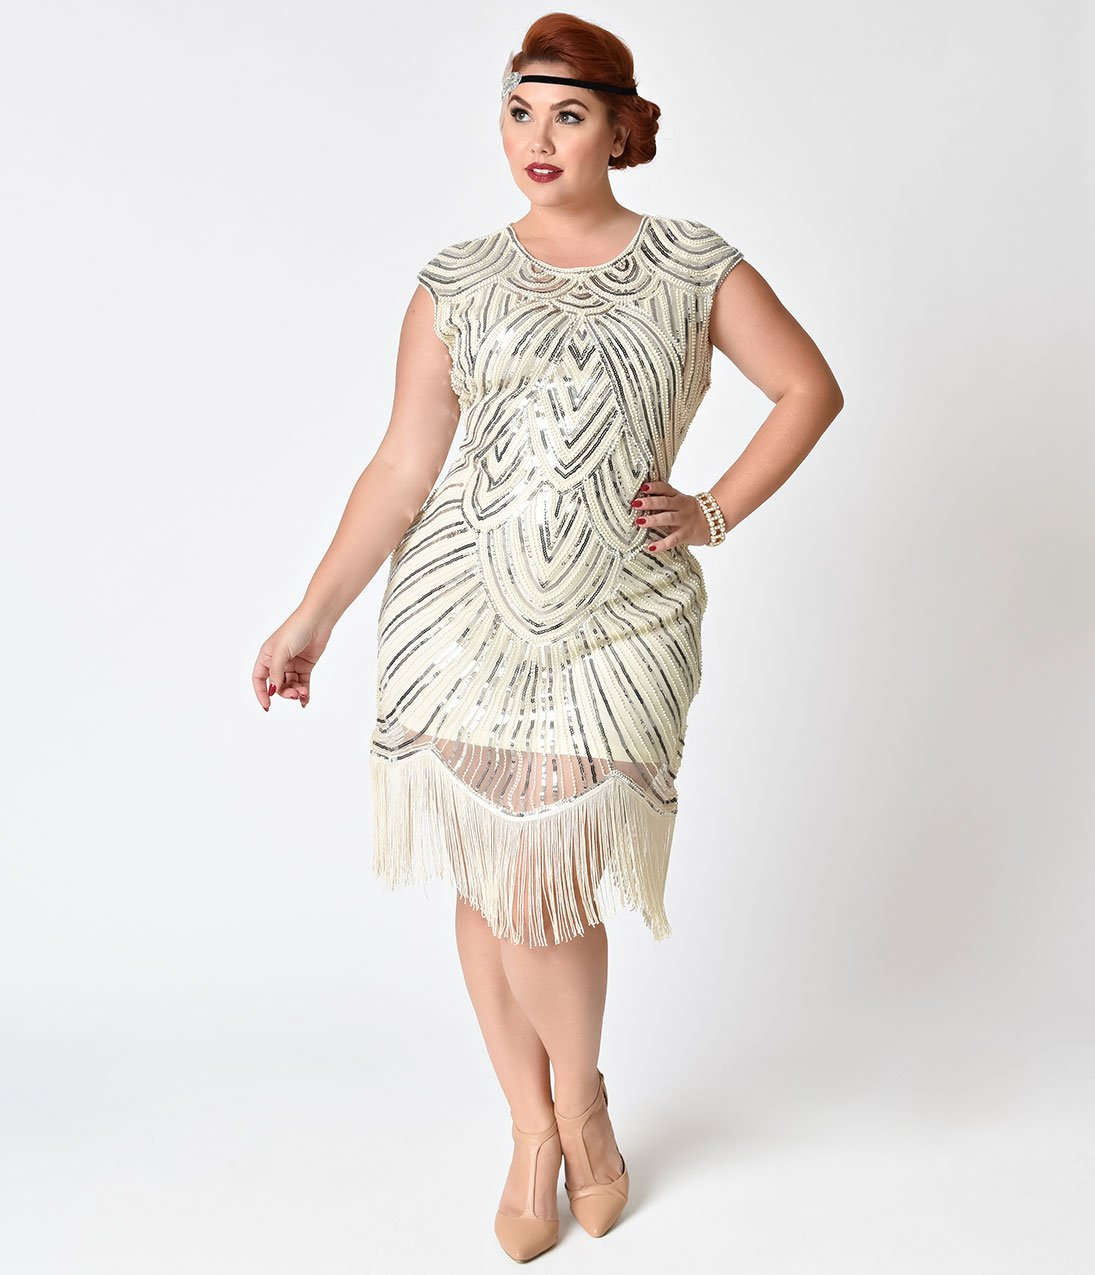 1920s Dresses & Flapper-Inspired Fashion – Unique Vintage ...